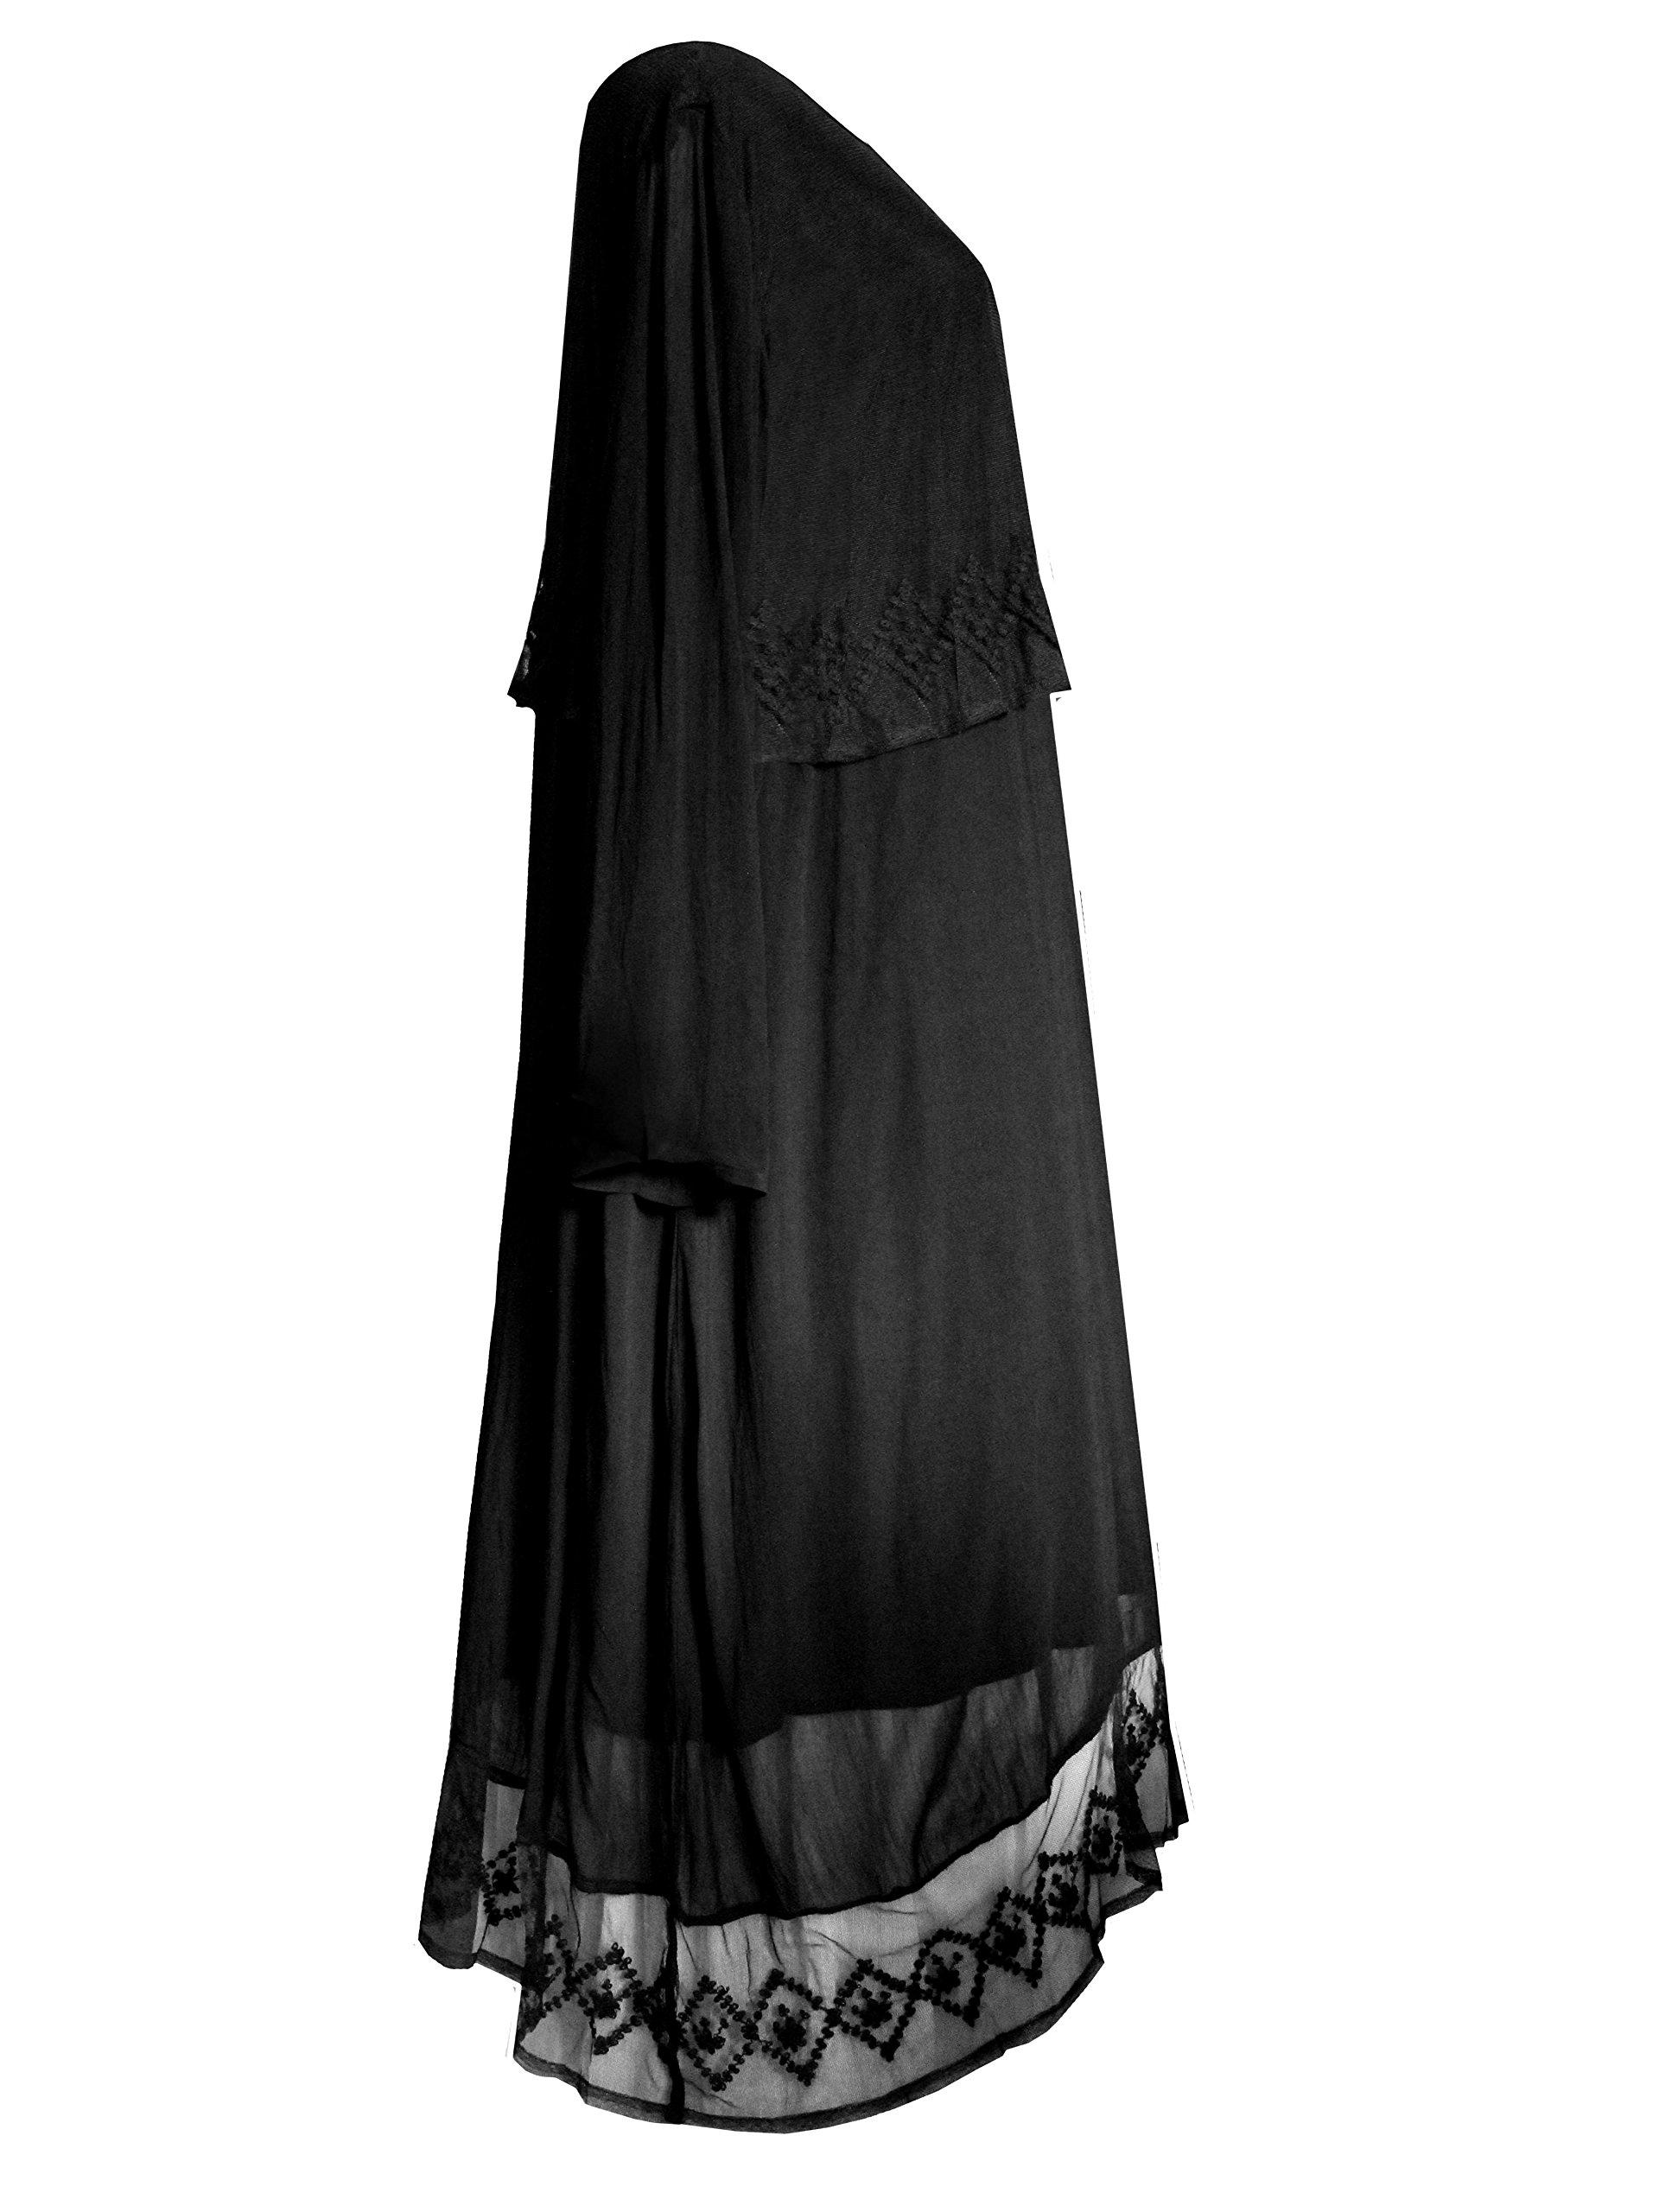 Funhouse Victorian Valentine Gothic Steampunk Juliet Renaissance Dress Black L XL 1X 4